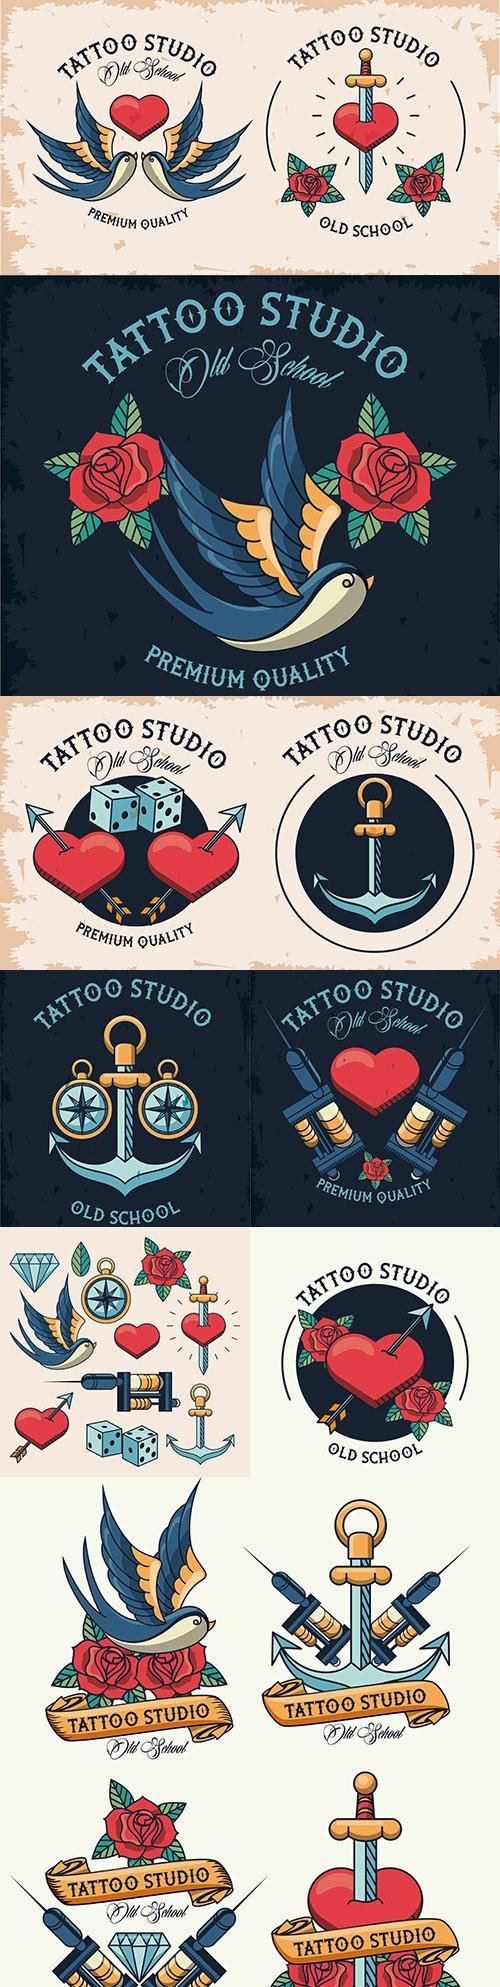 Studio tattoo set design elements and logo